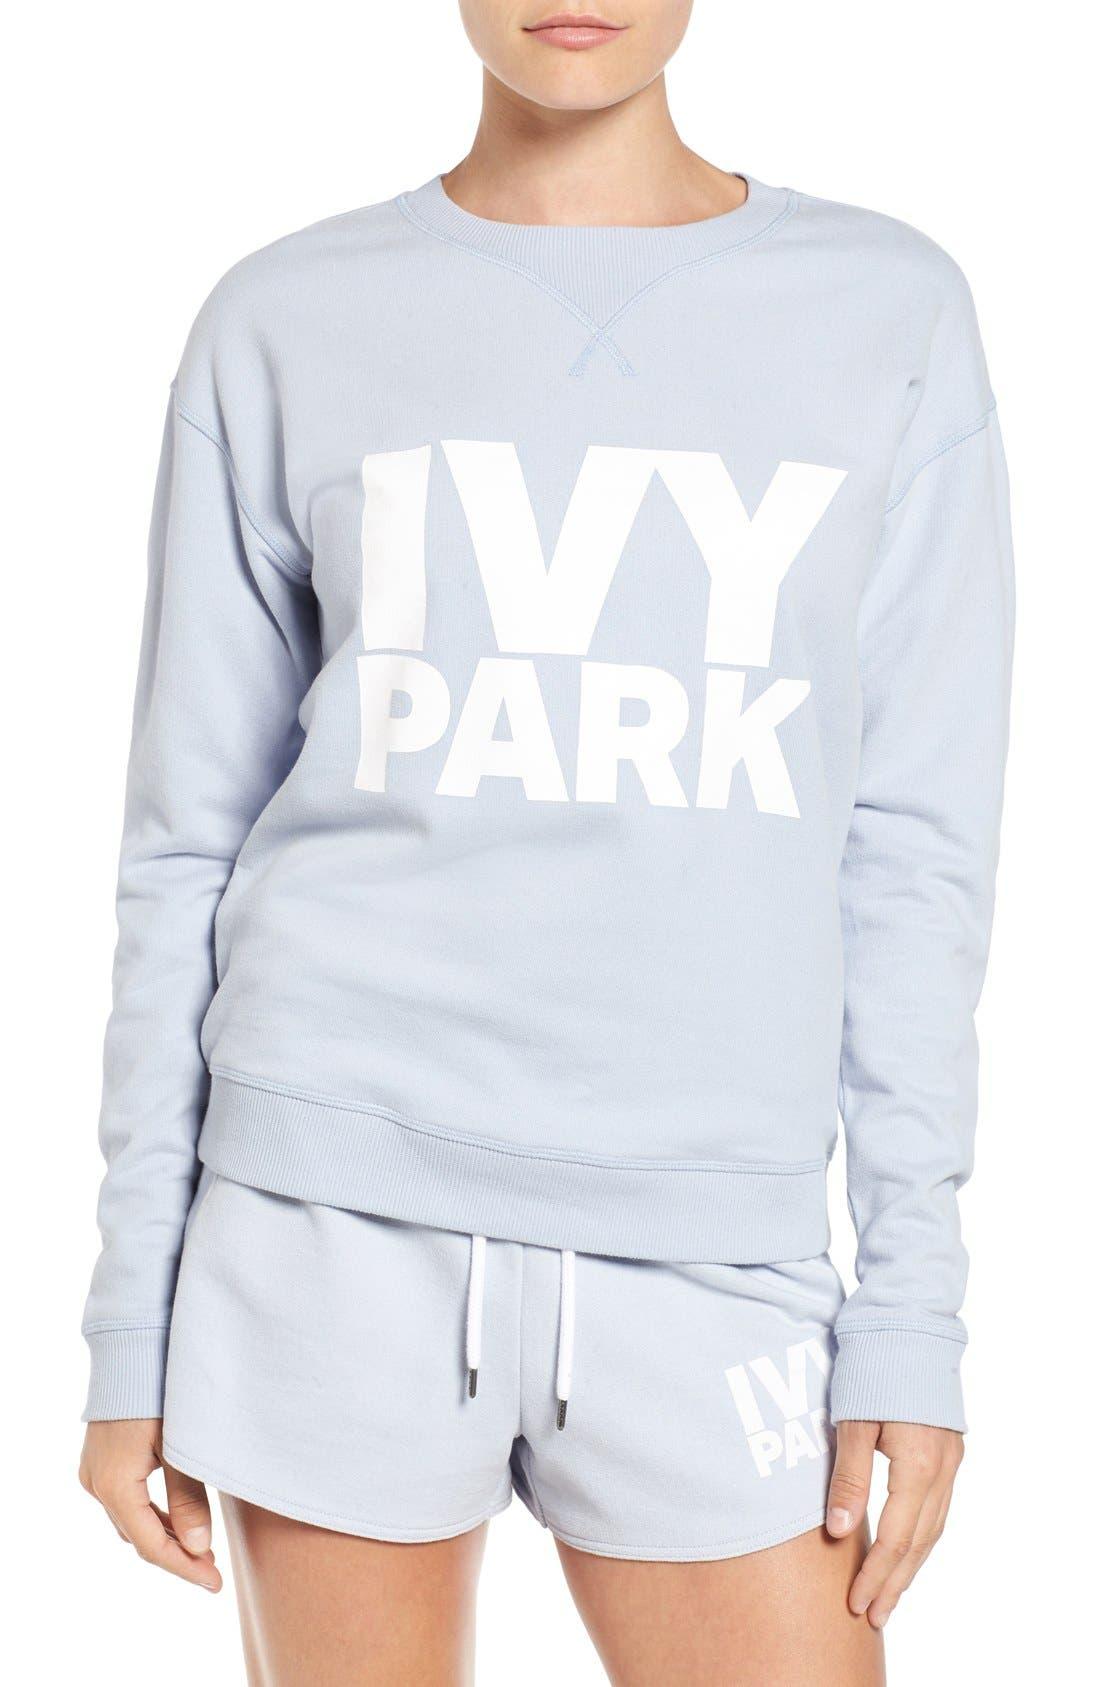 Alternate Image 1 Selected - IVY PARK® Logo Peached Sweatshirt